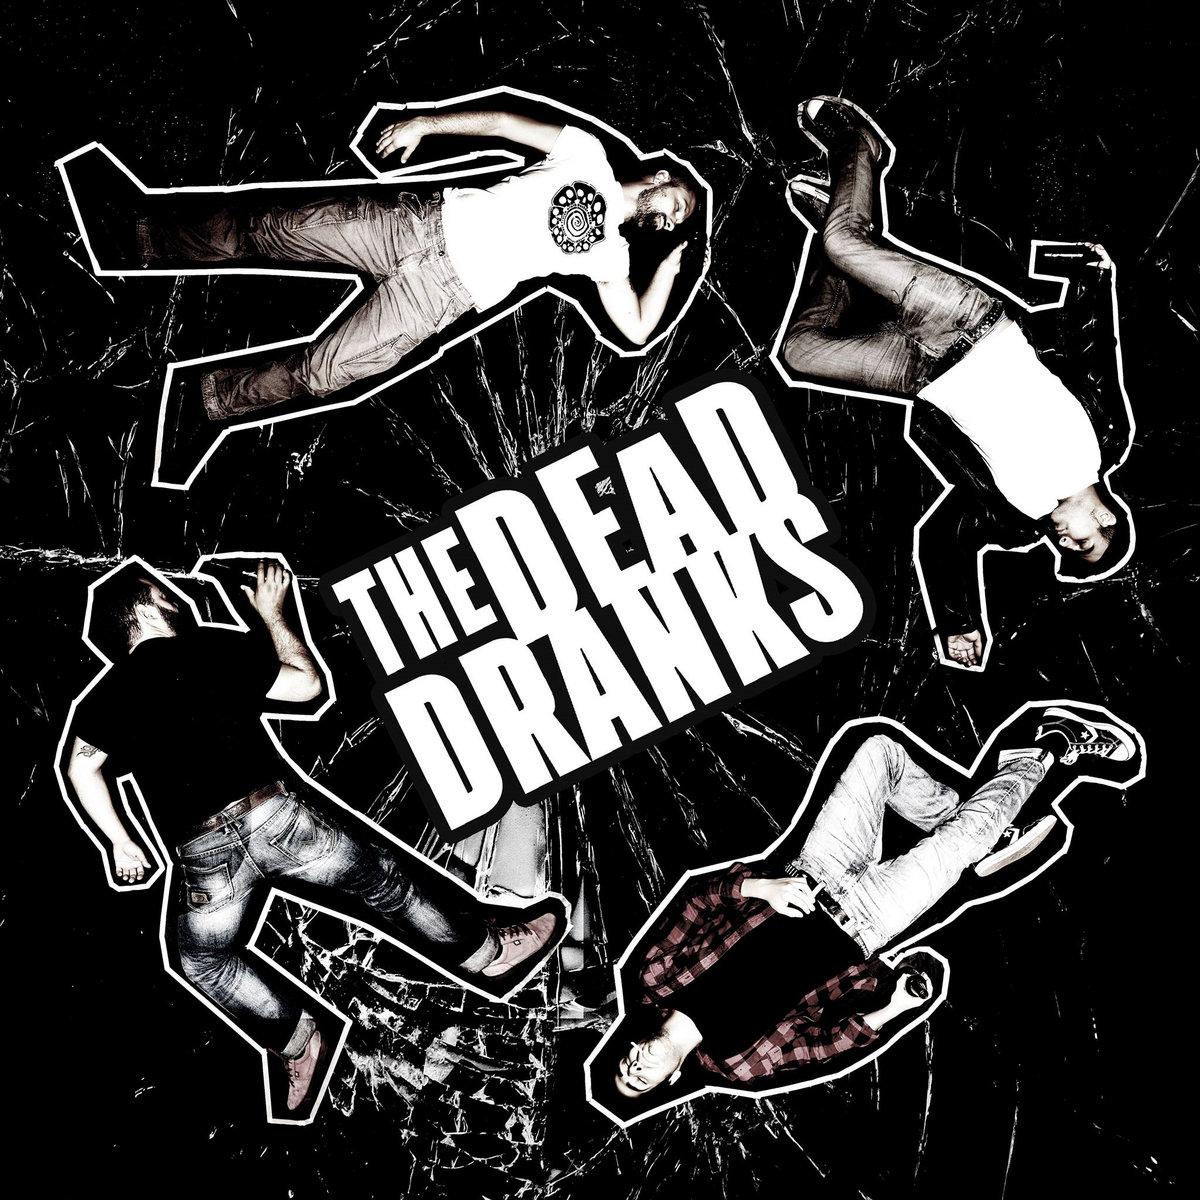 The Dead Dranks - s/t 7